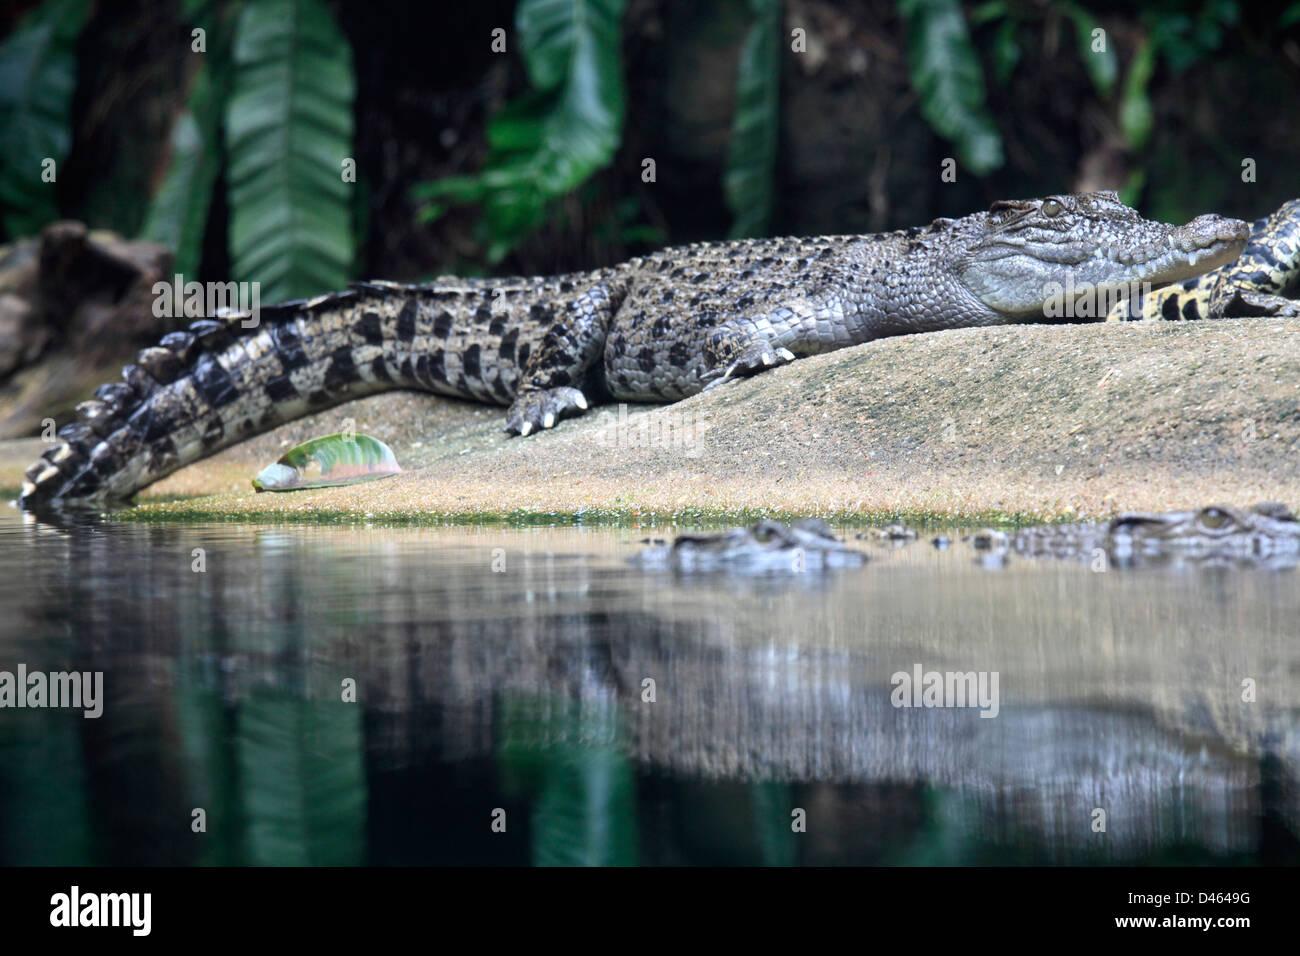 Saltwater crocodile, crocodylus porosus, Singapore Zoo, - Stock Image